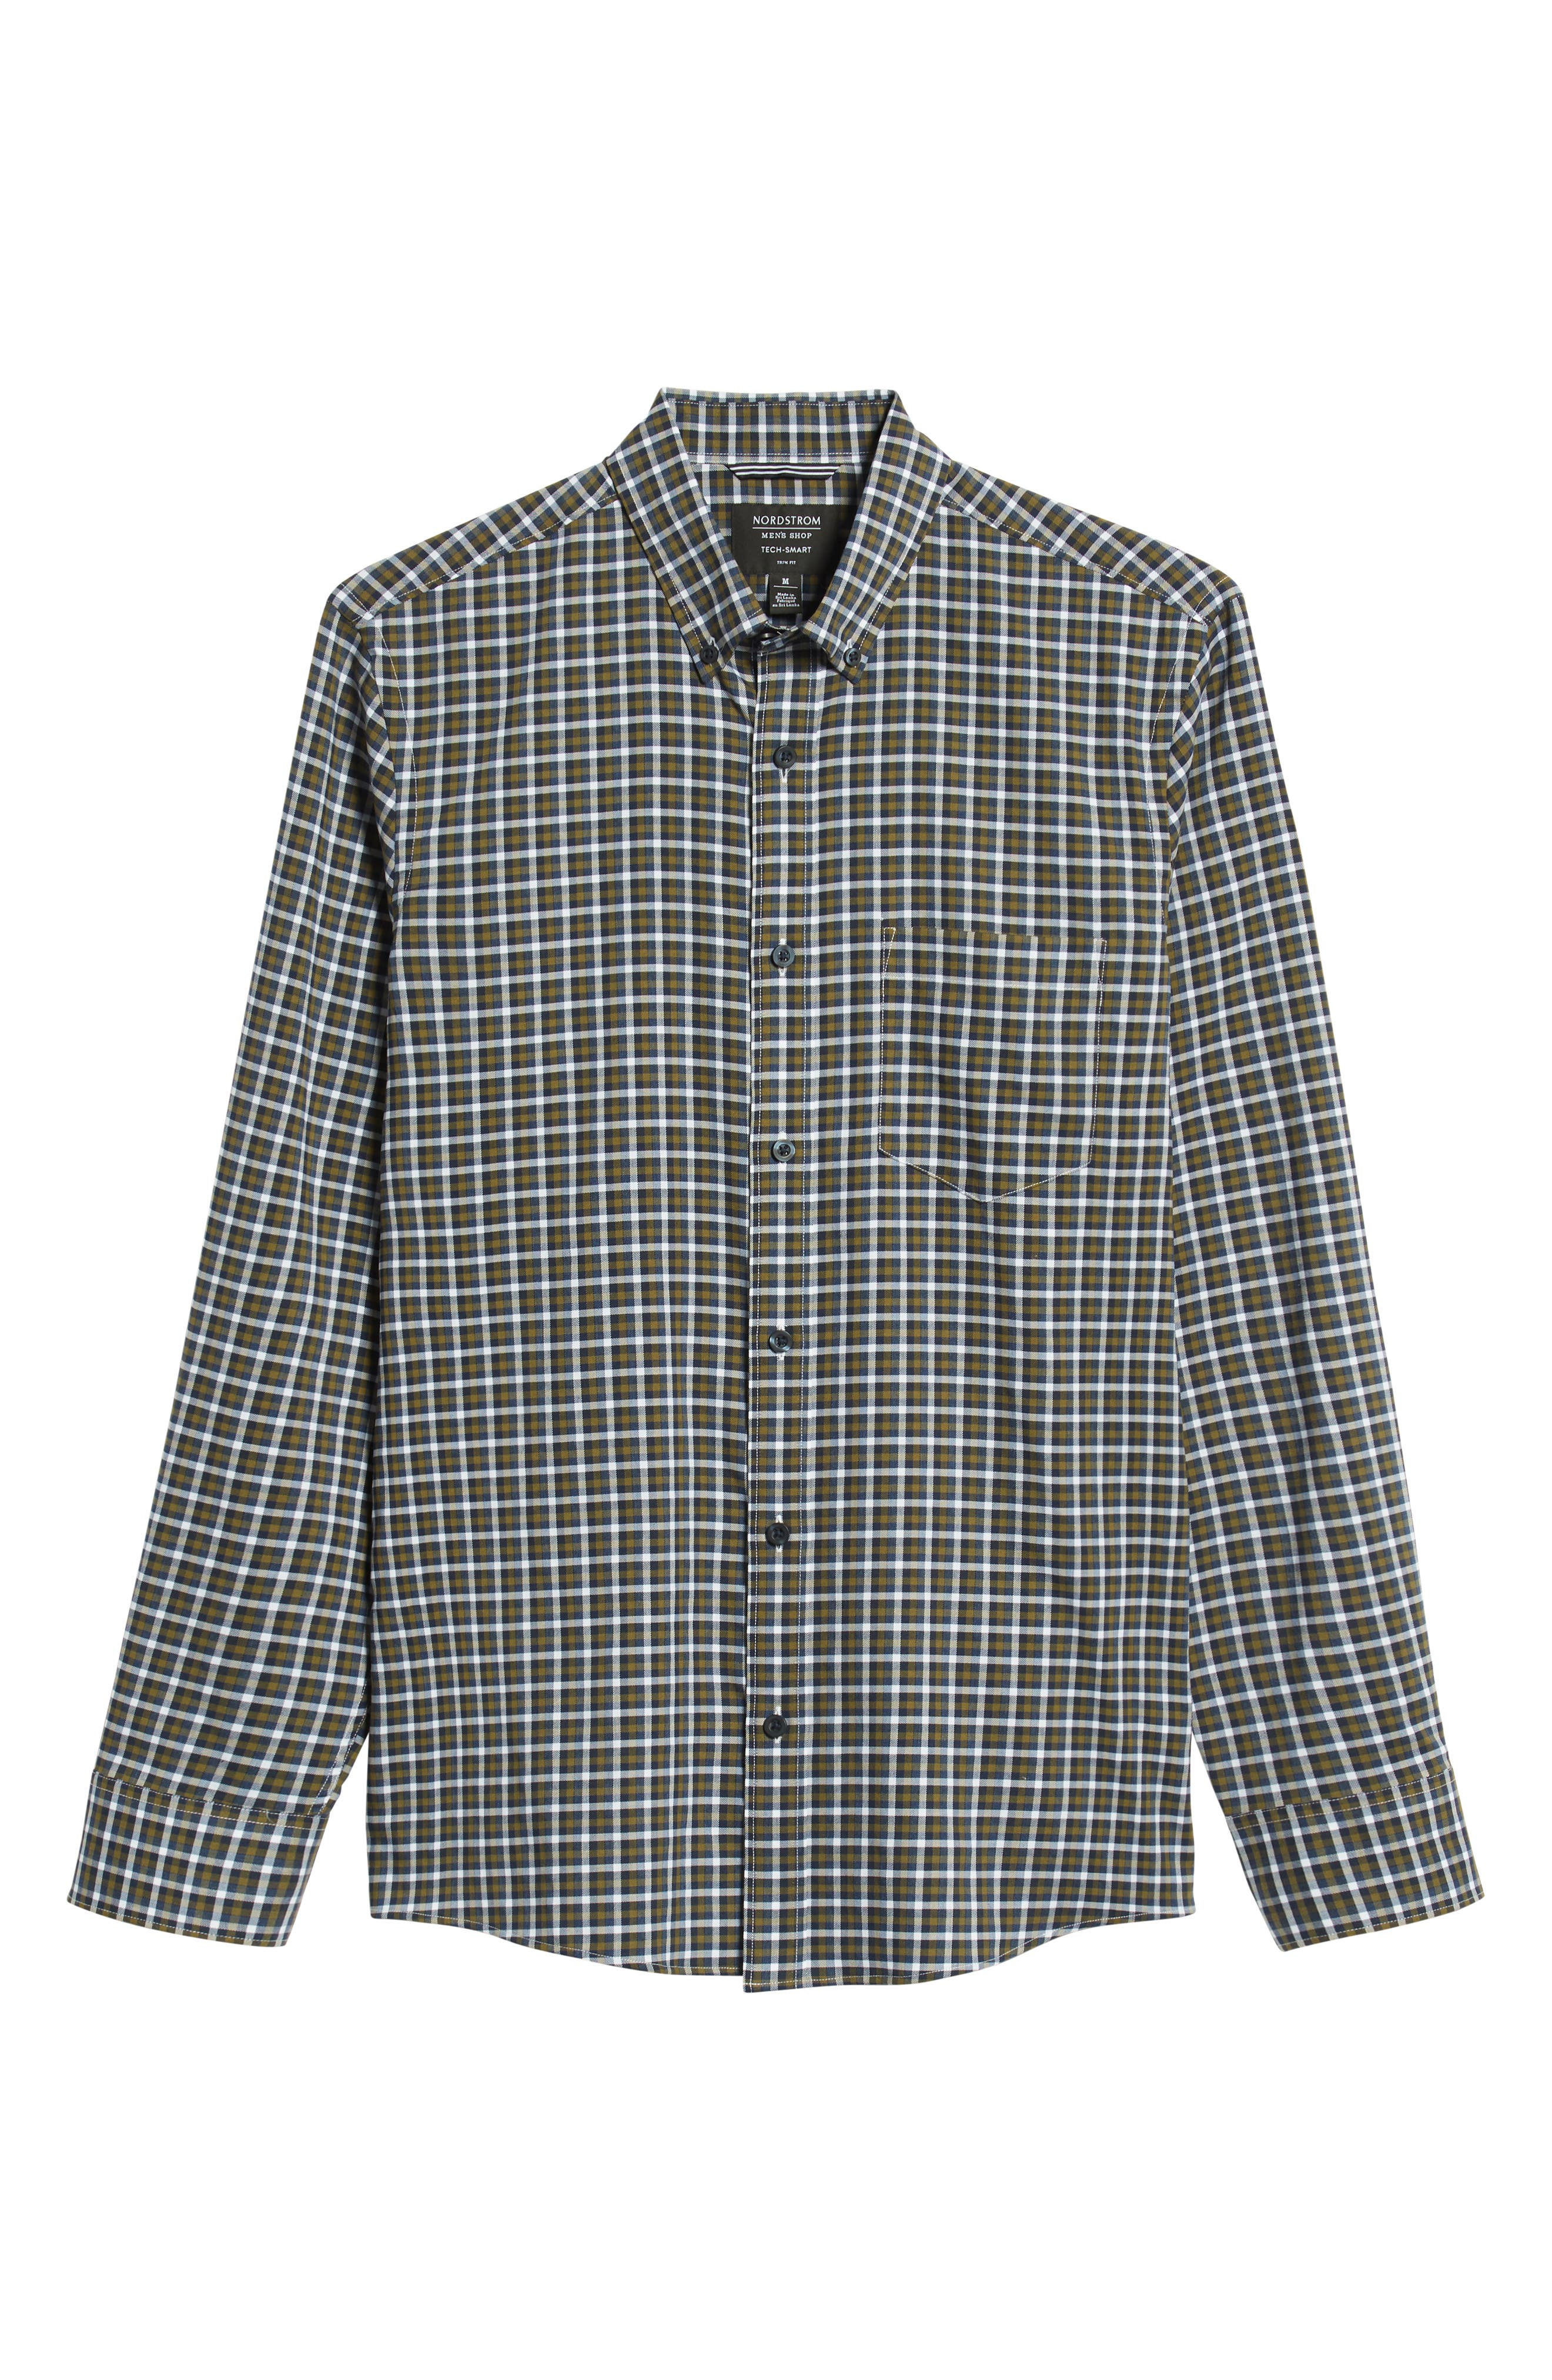 Tech-Smart Slim Fit Check Sport Shirt,                             Alternate thumbnail 5, color,                             NAVY NIGHT OLIVE CHECK